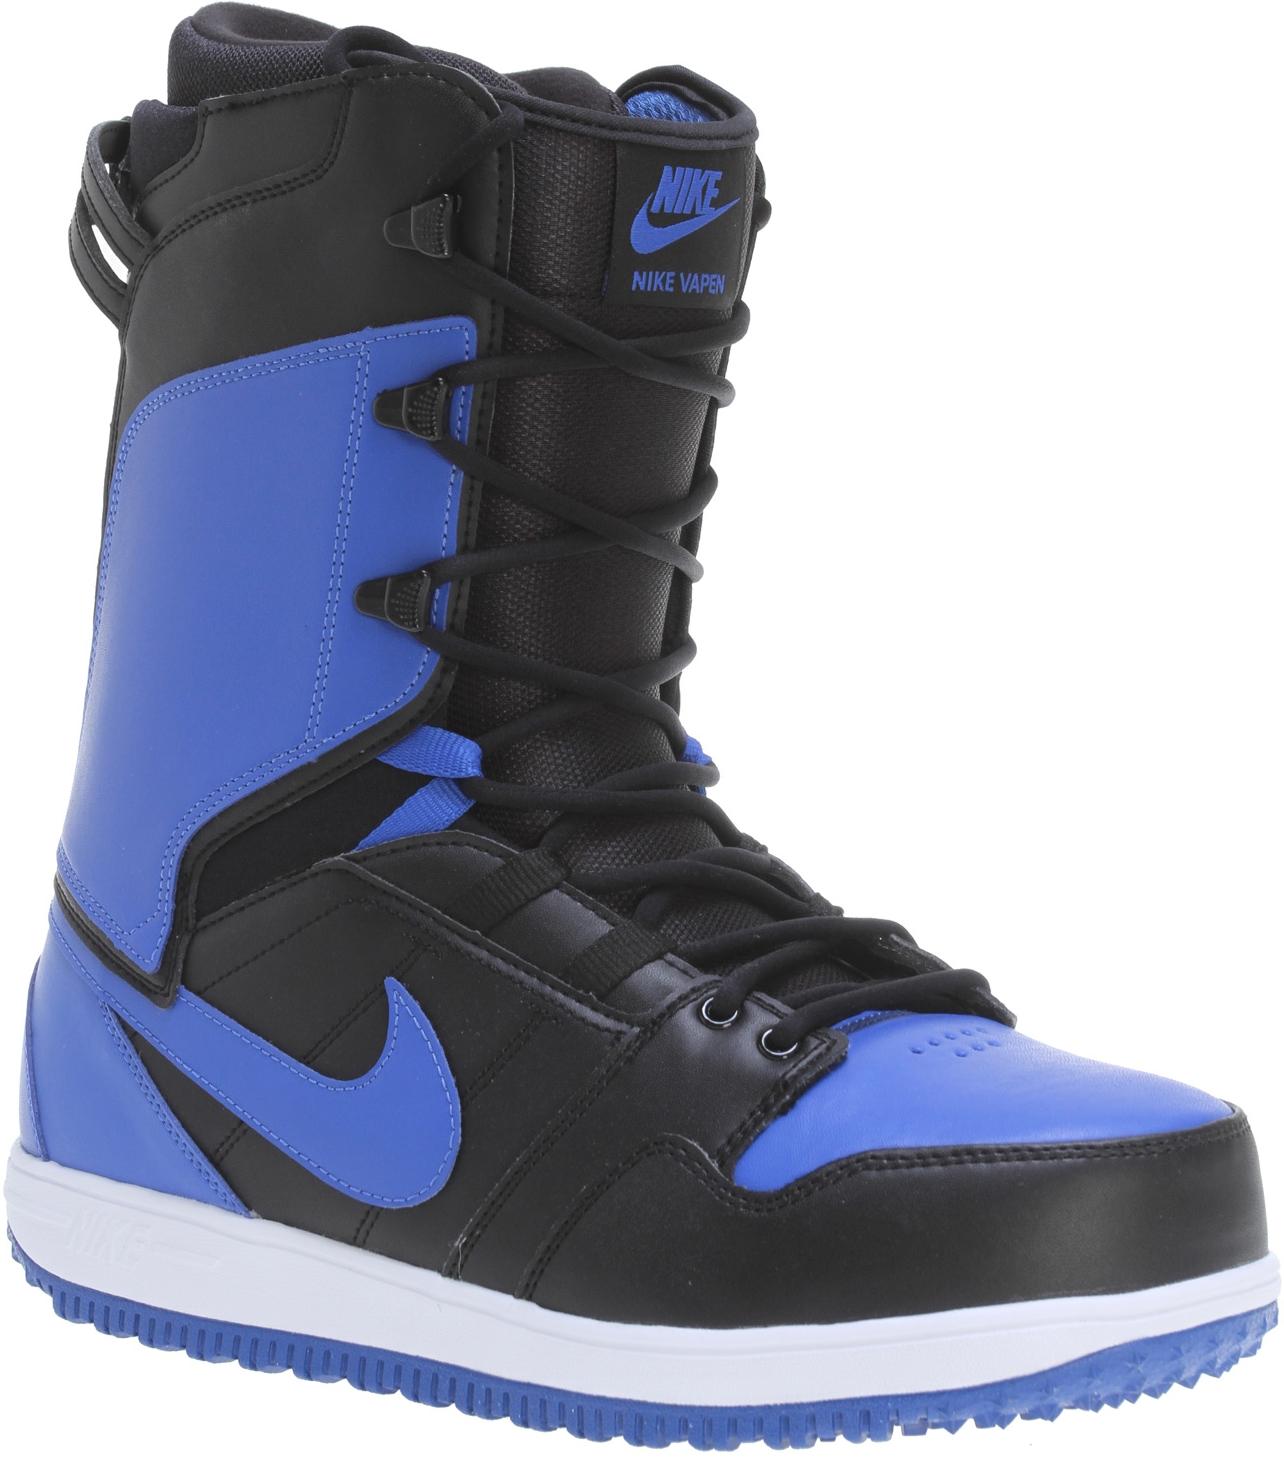 Nike Vapen Snowboard Boot, $200